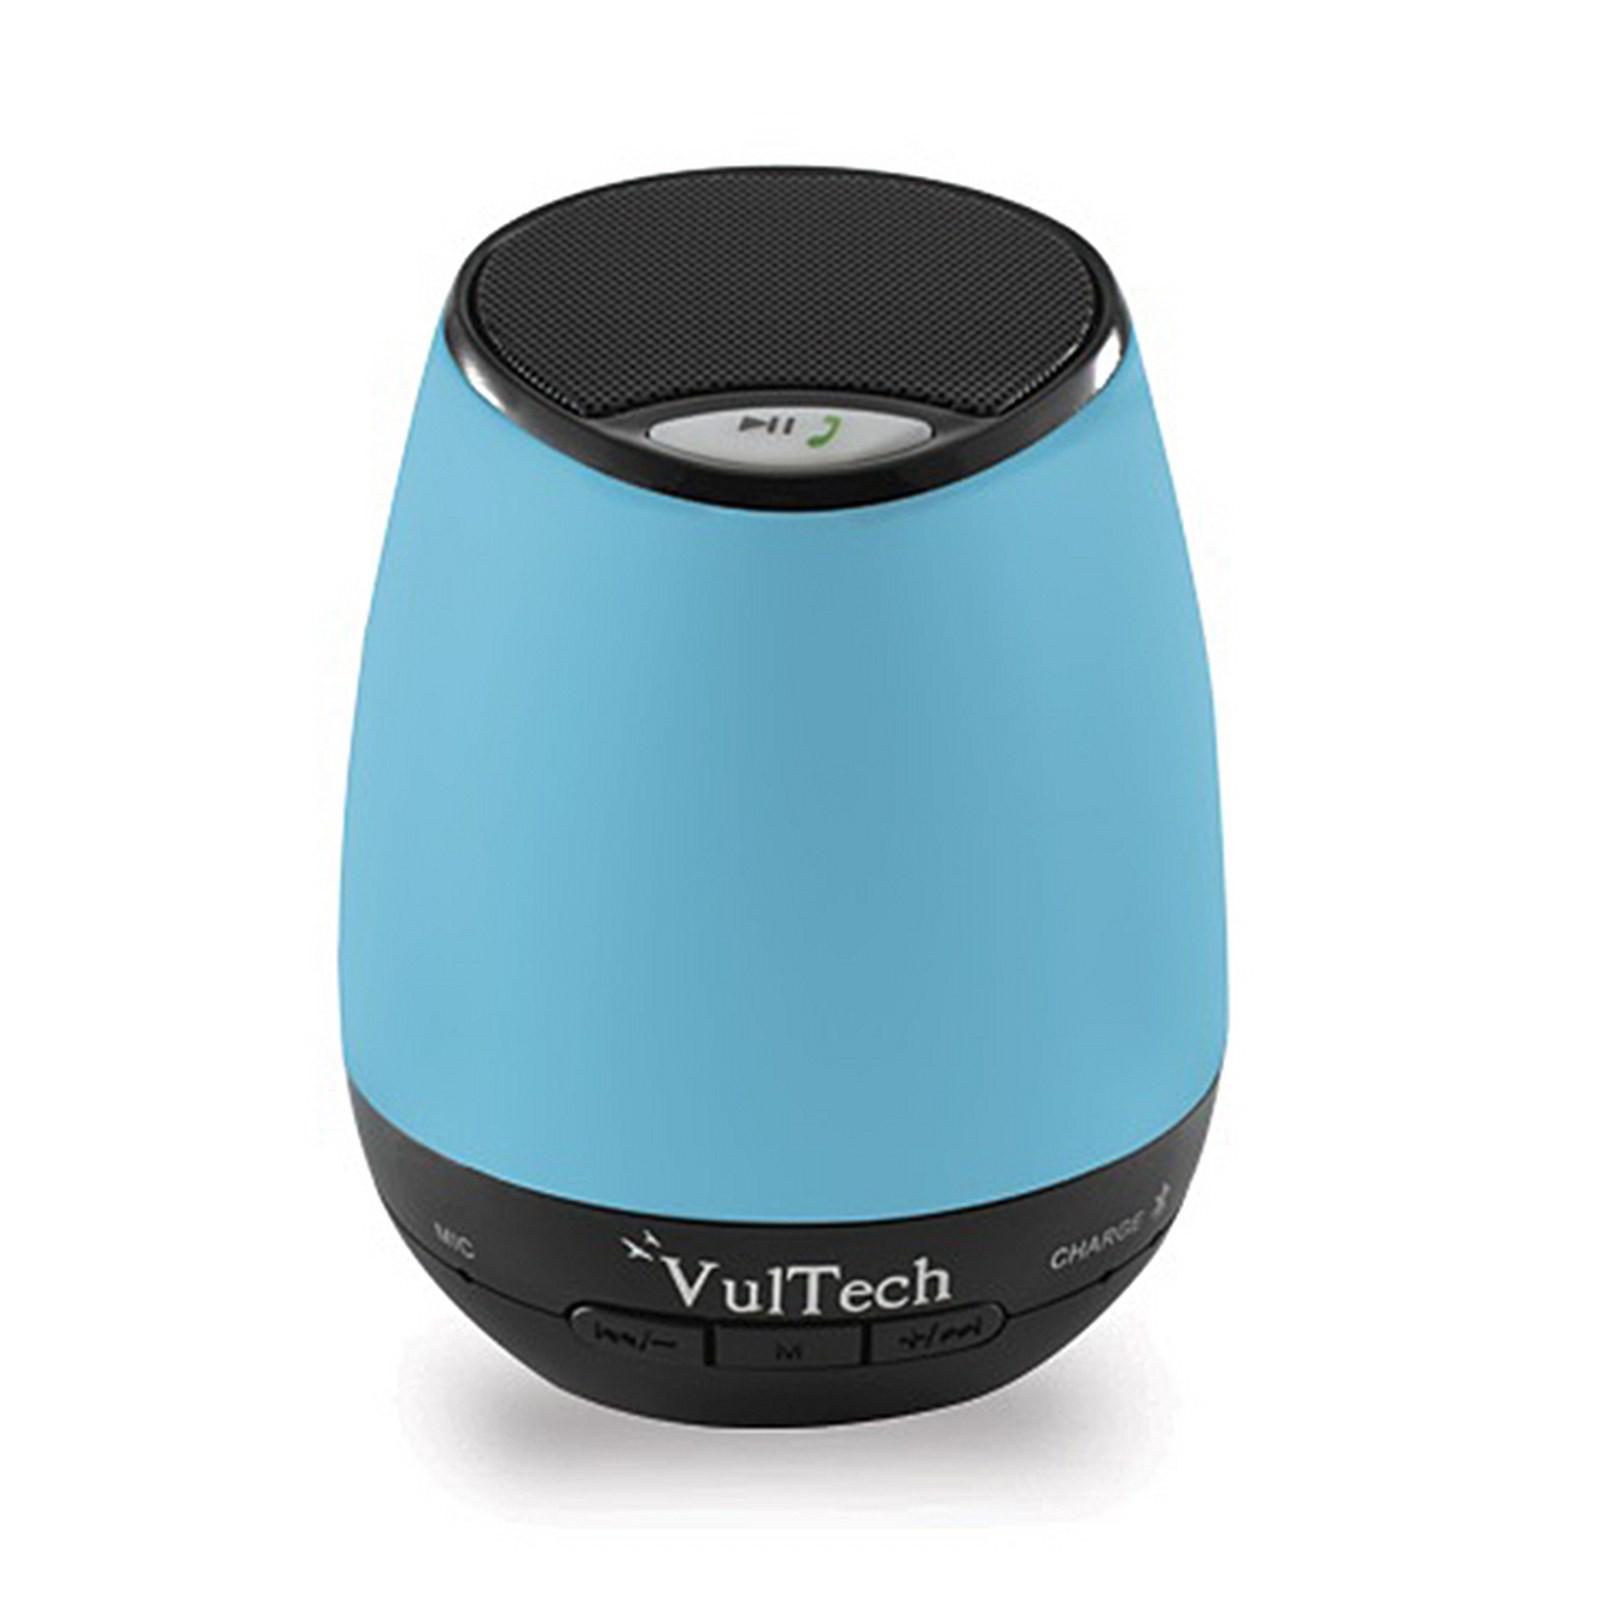 CASSA AUDIO BLUETOOTH VULTECH SPEAKER LETTORE MP3 USB MICRO SD VIVAVOCE VULTECH